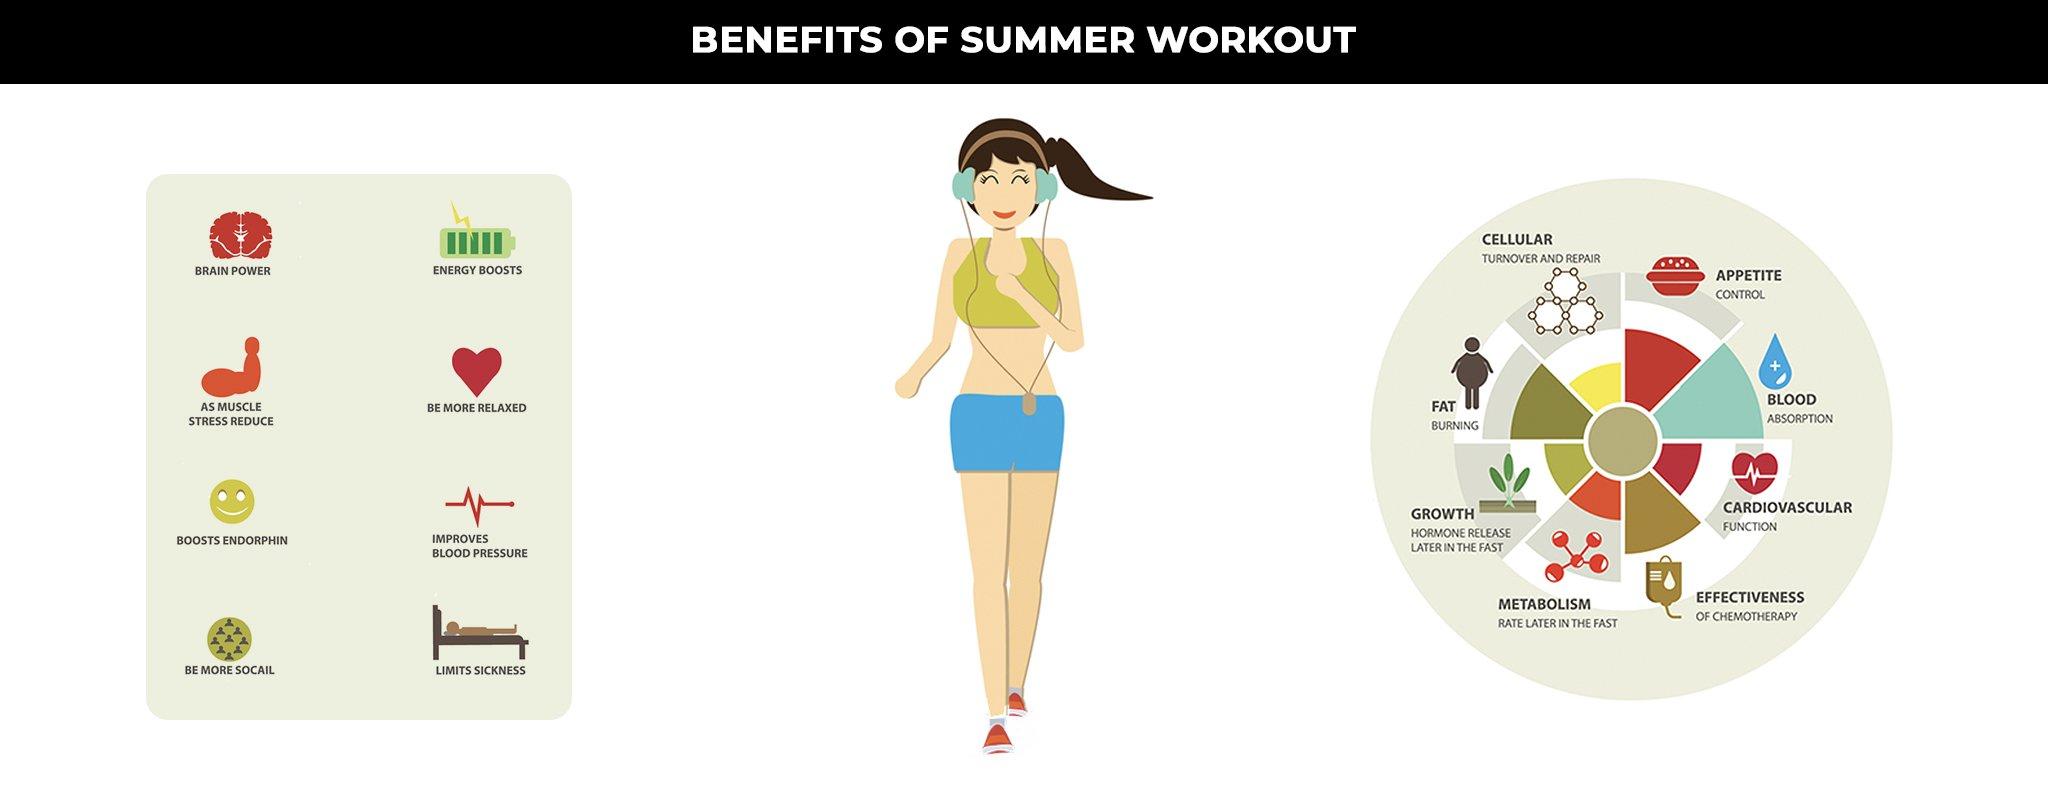 Benefits of summer Workout